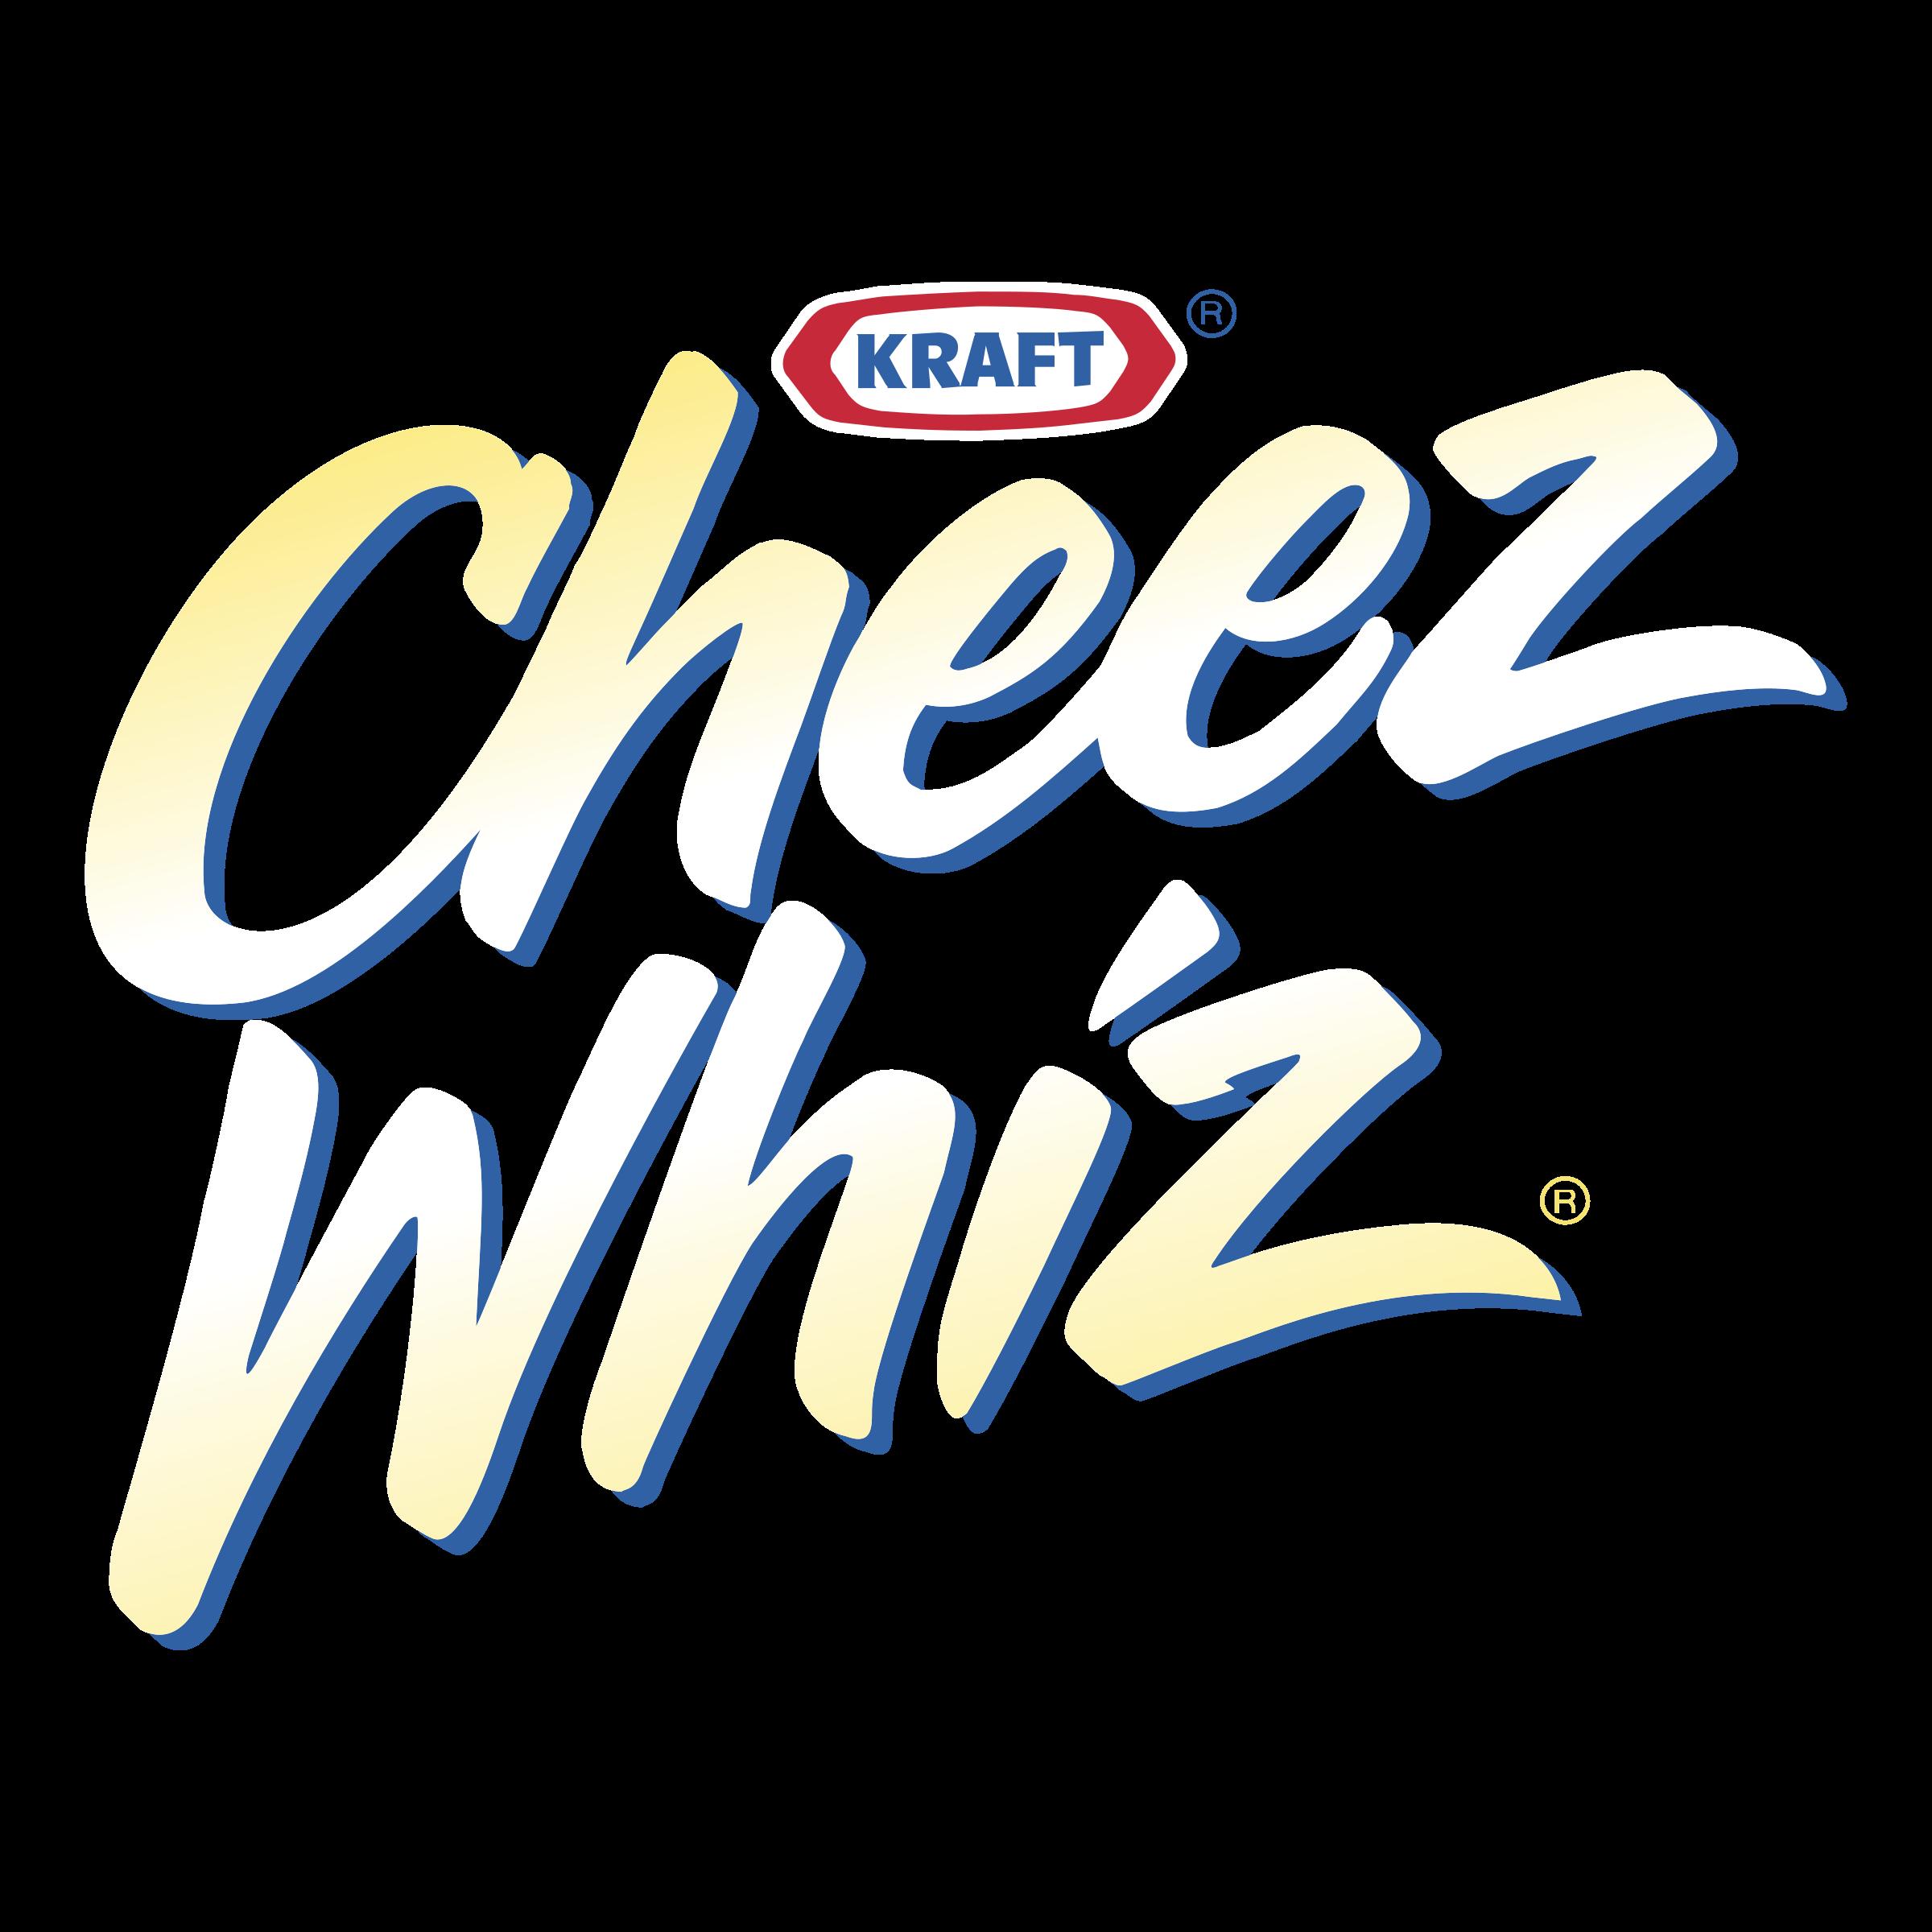 Cheez Whiz Logo PNG Transparent & SVG Vector.